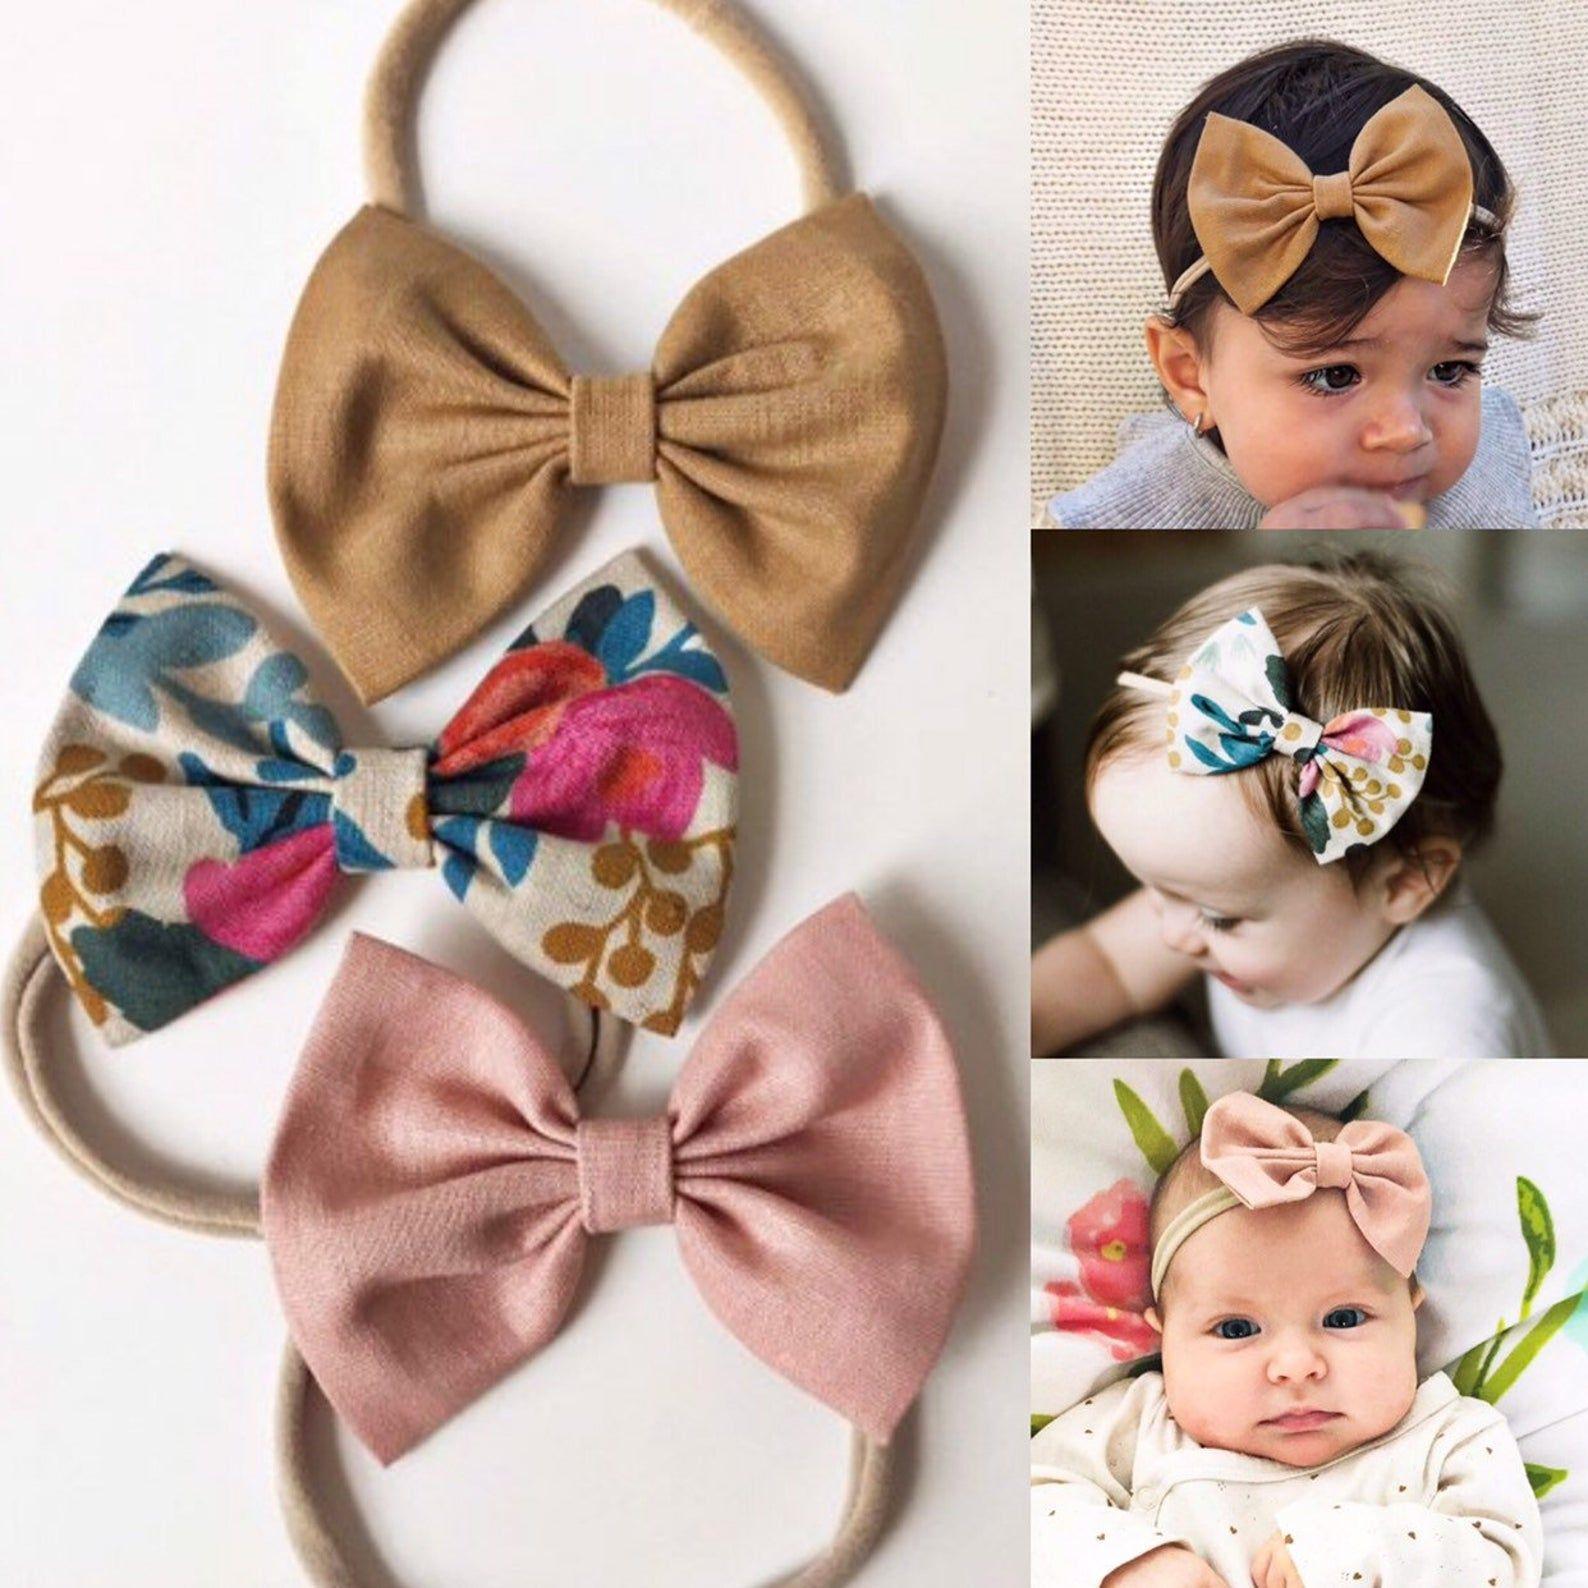 Baby Bow  Baby Headband  Nylon Headbands  Fabric Bow Headband  Fabric Bows  Hair Accessories  Rifle Paper Co Bow  Floral Bow